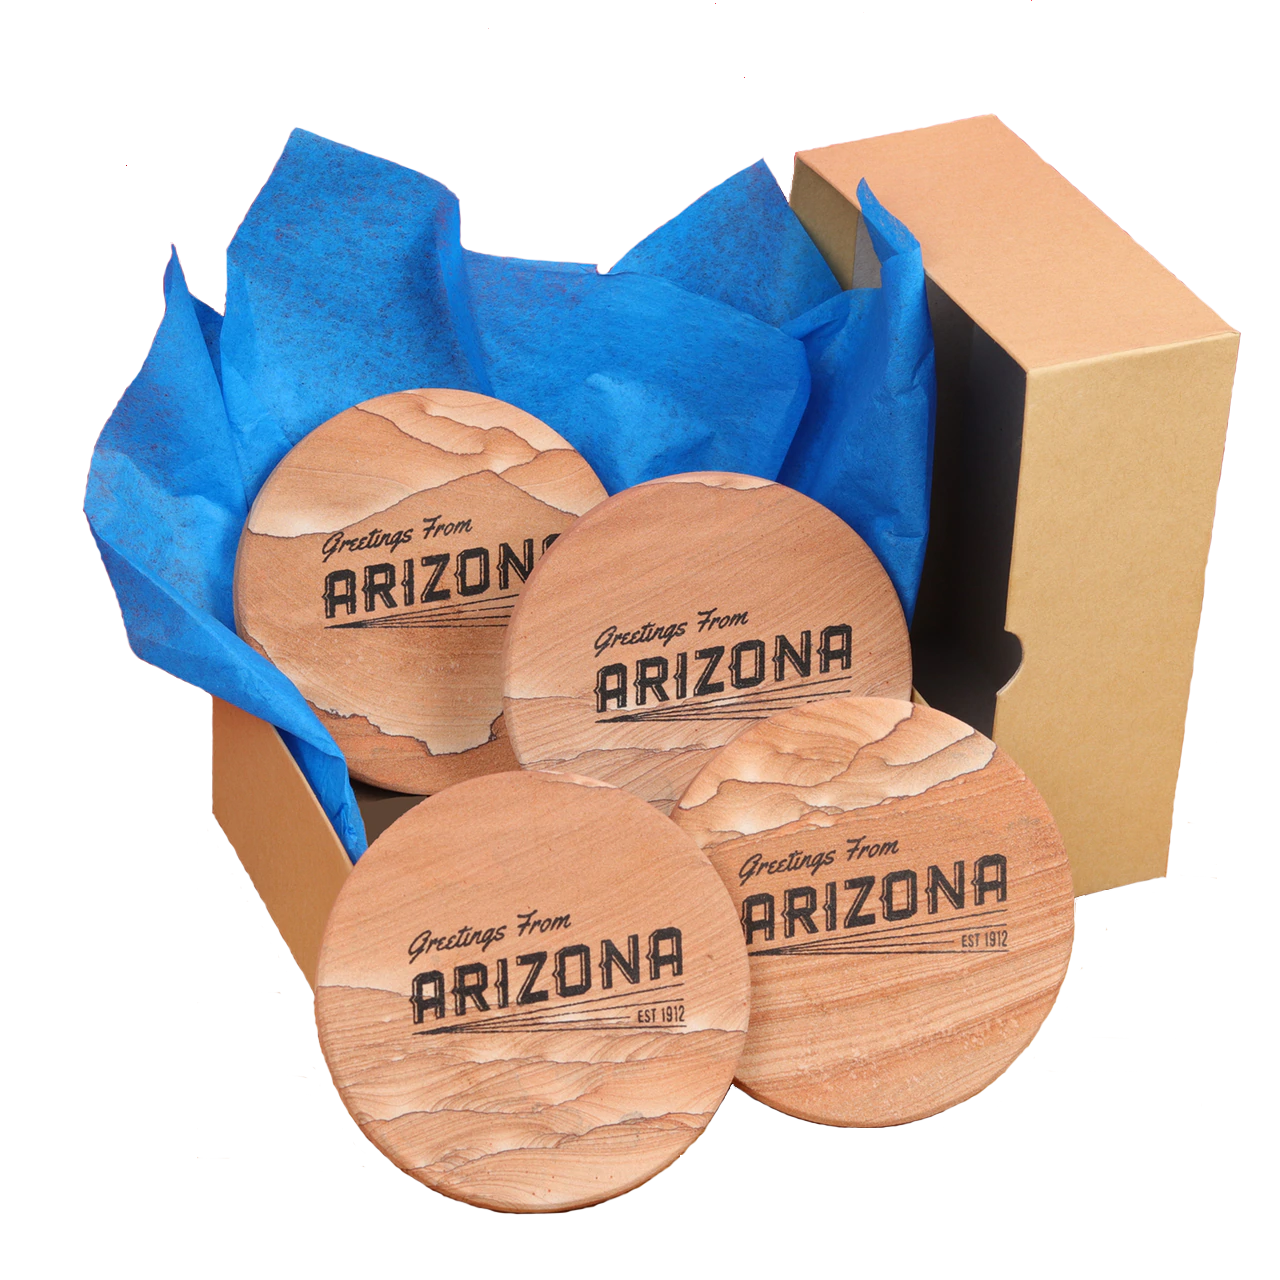 Arizona Gift Box Set of 4 Coasters